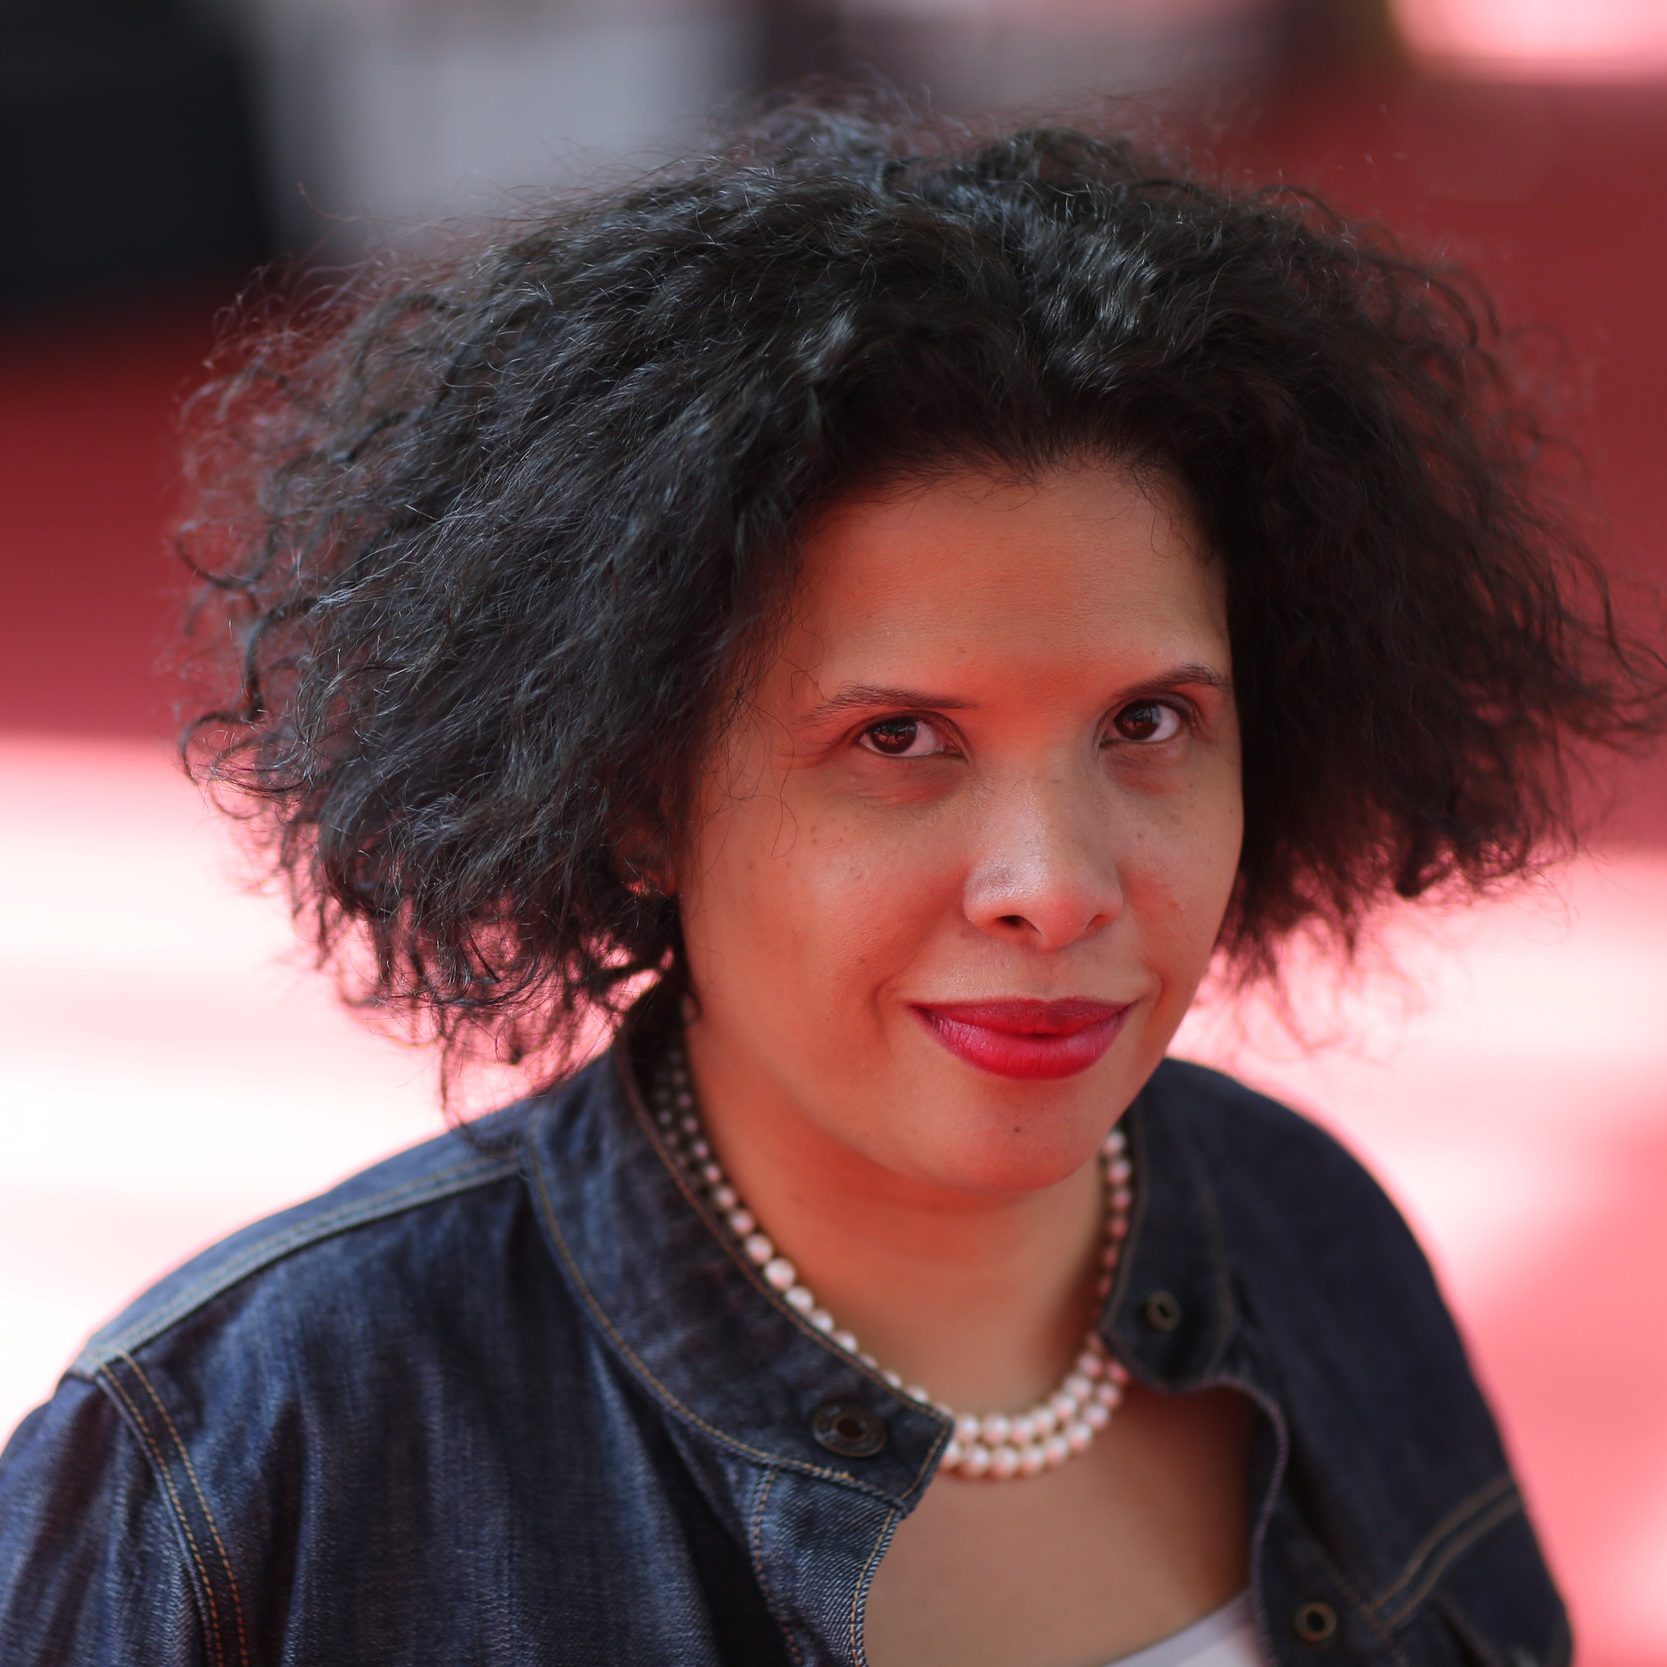 Juleyka Lantigua-Williams , CEO of Lantigua Williams & Co.